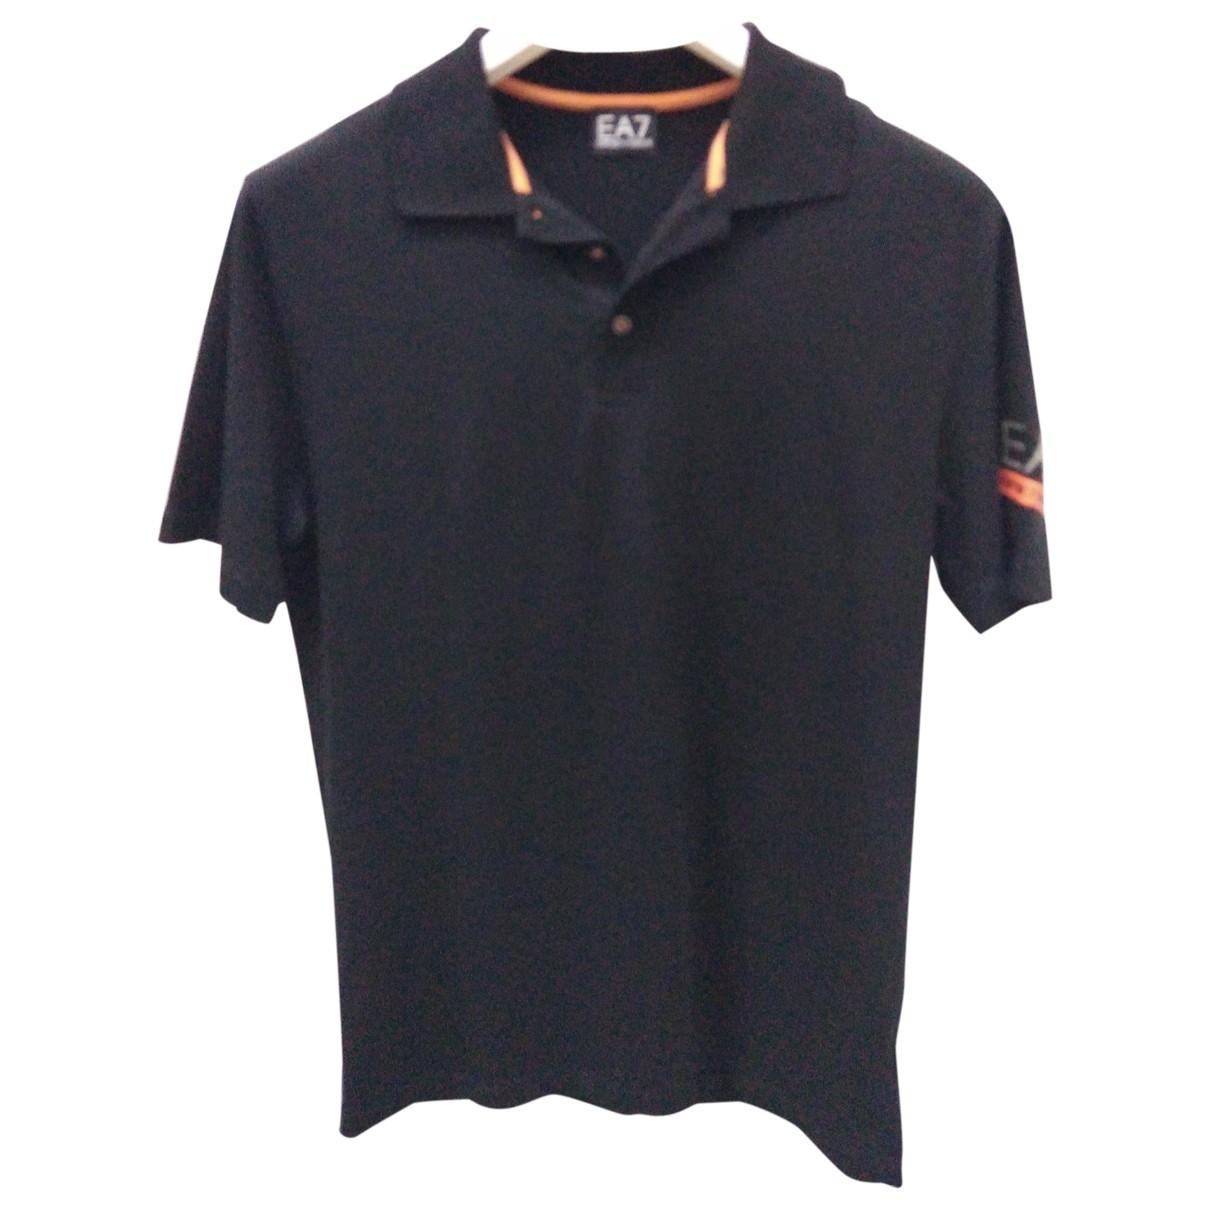 Emporio Armani \N Black Cotton Polo shirts for Men XL International